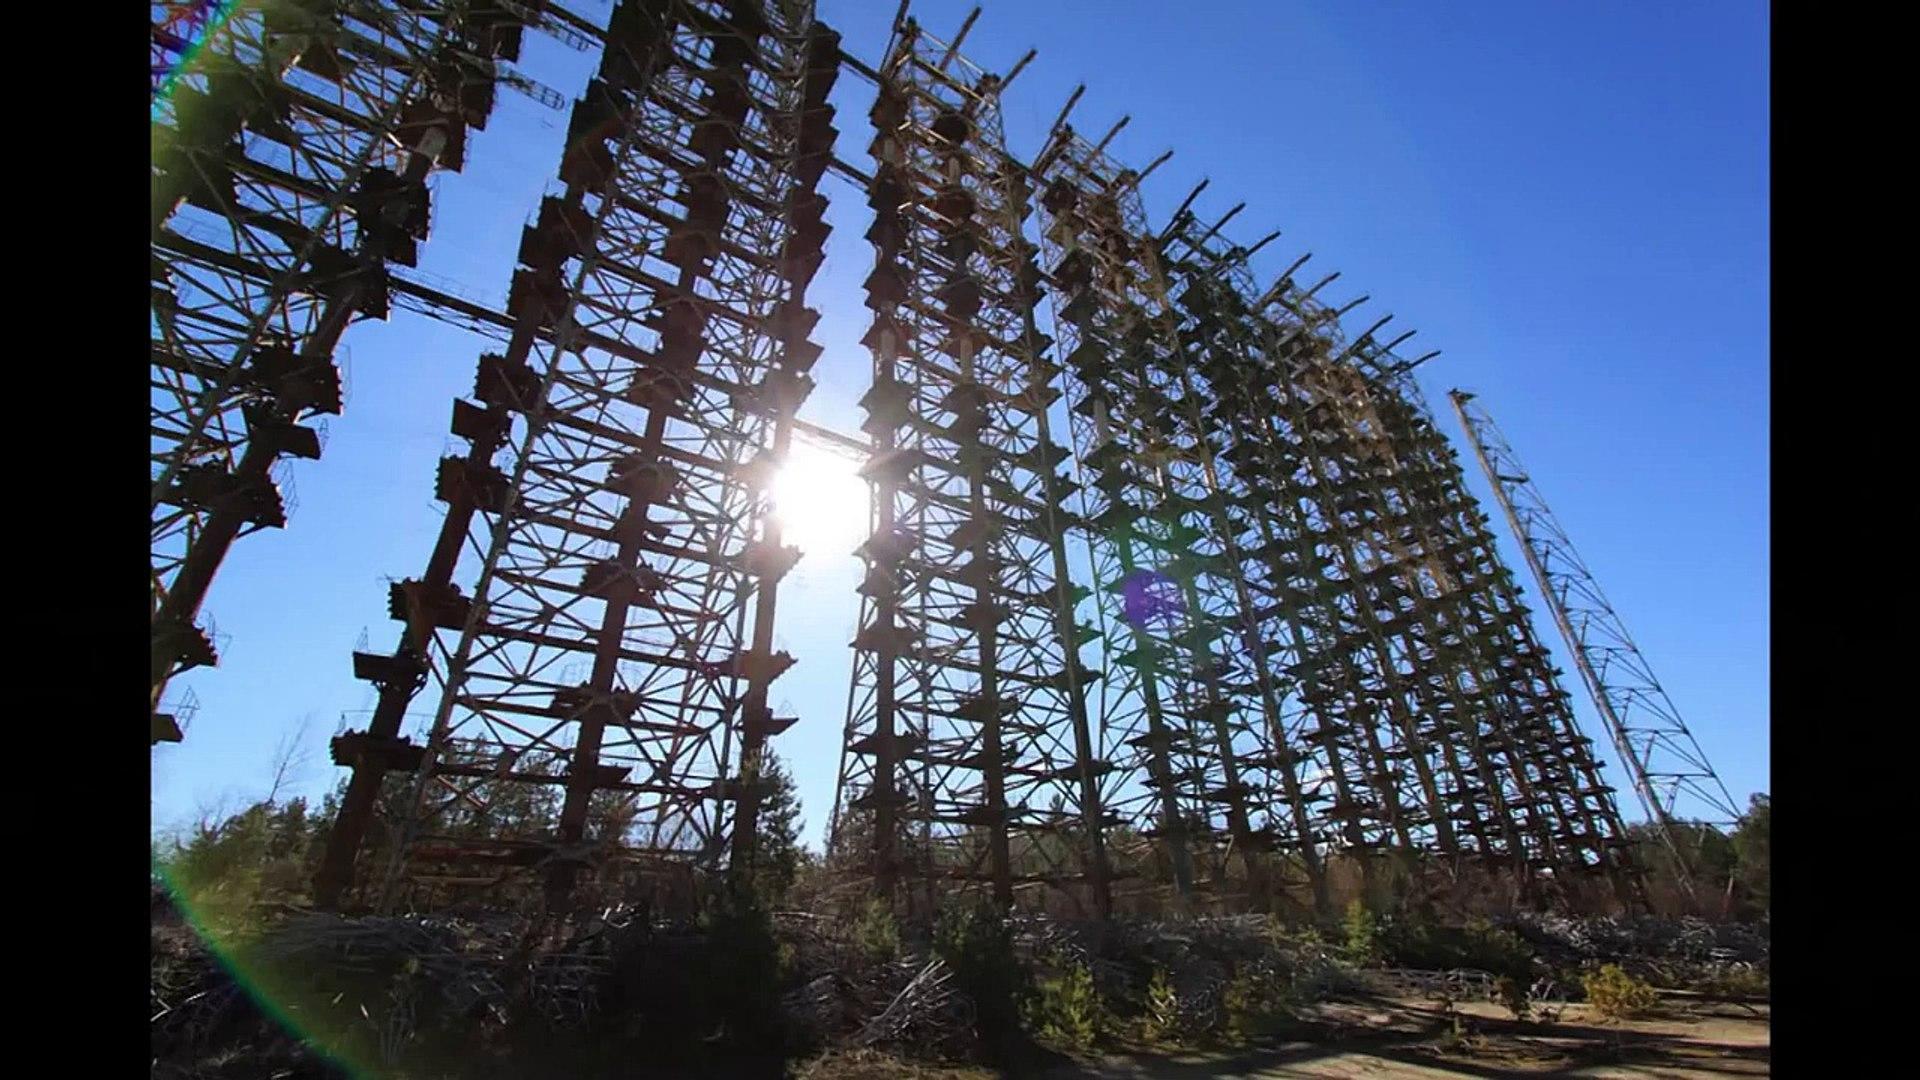 Chernobyl Exclusion Zone. Several views at Chernobyl-2 OTH Radar. Вид на  ЗГРЛС Чернобыль-2